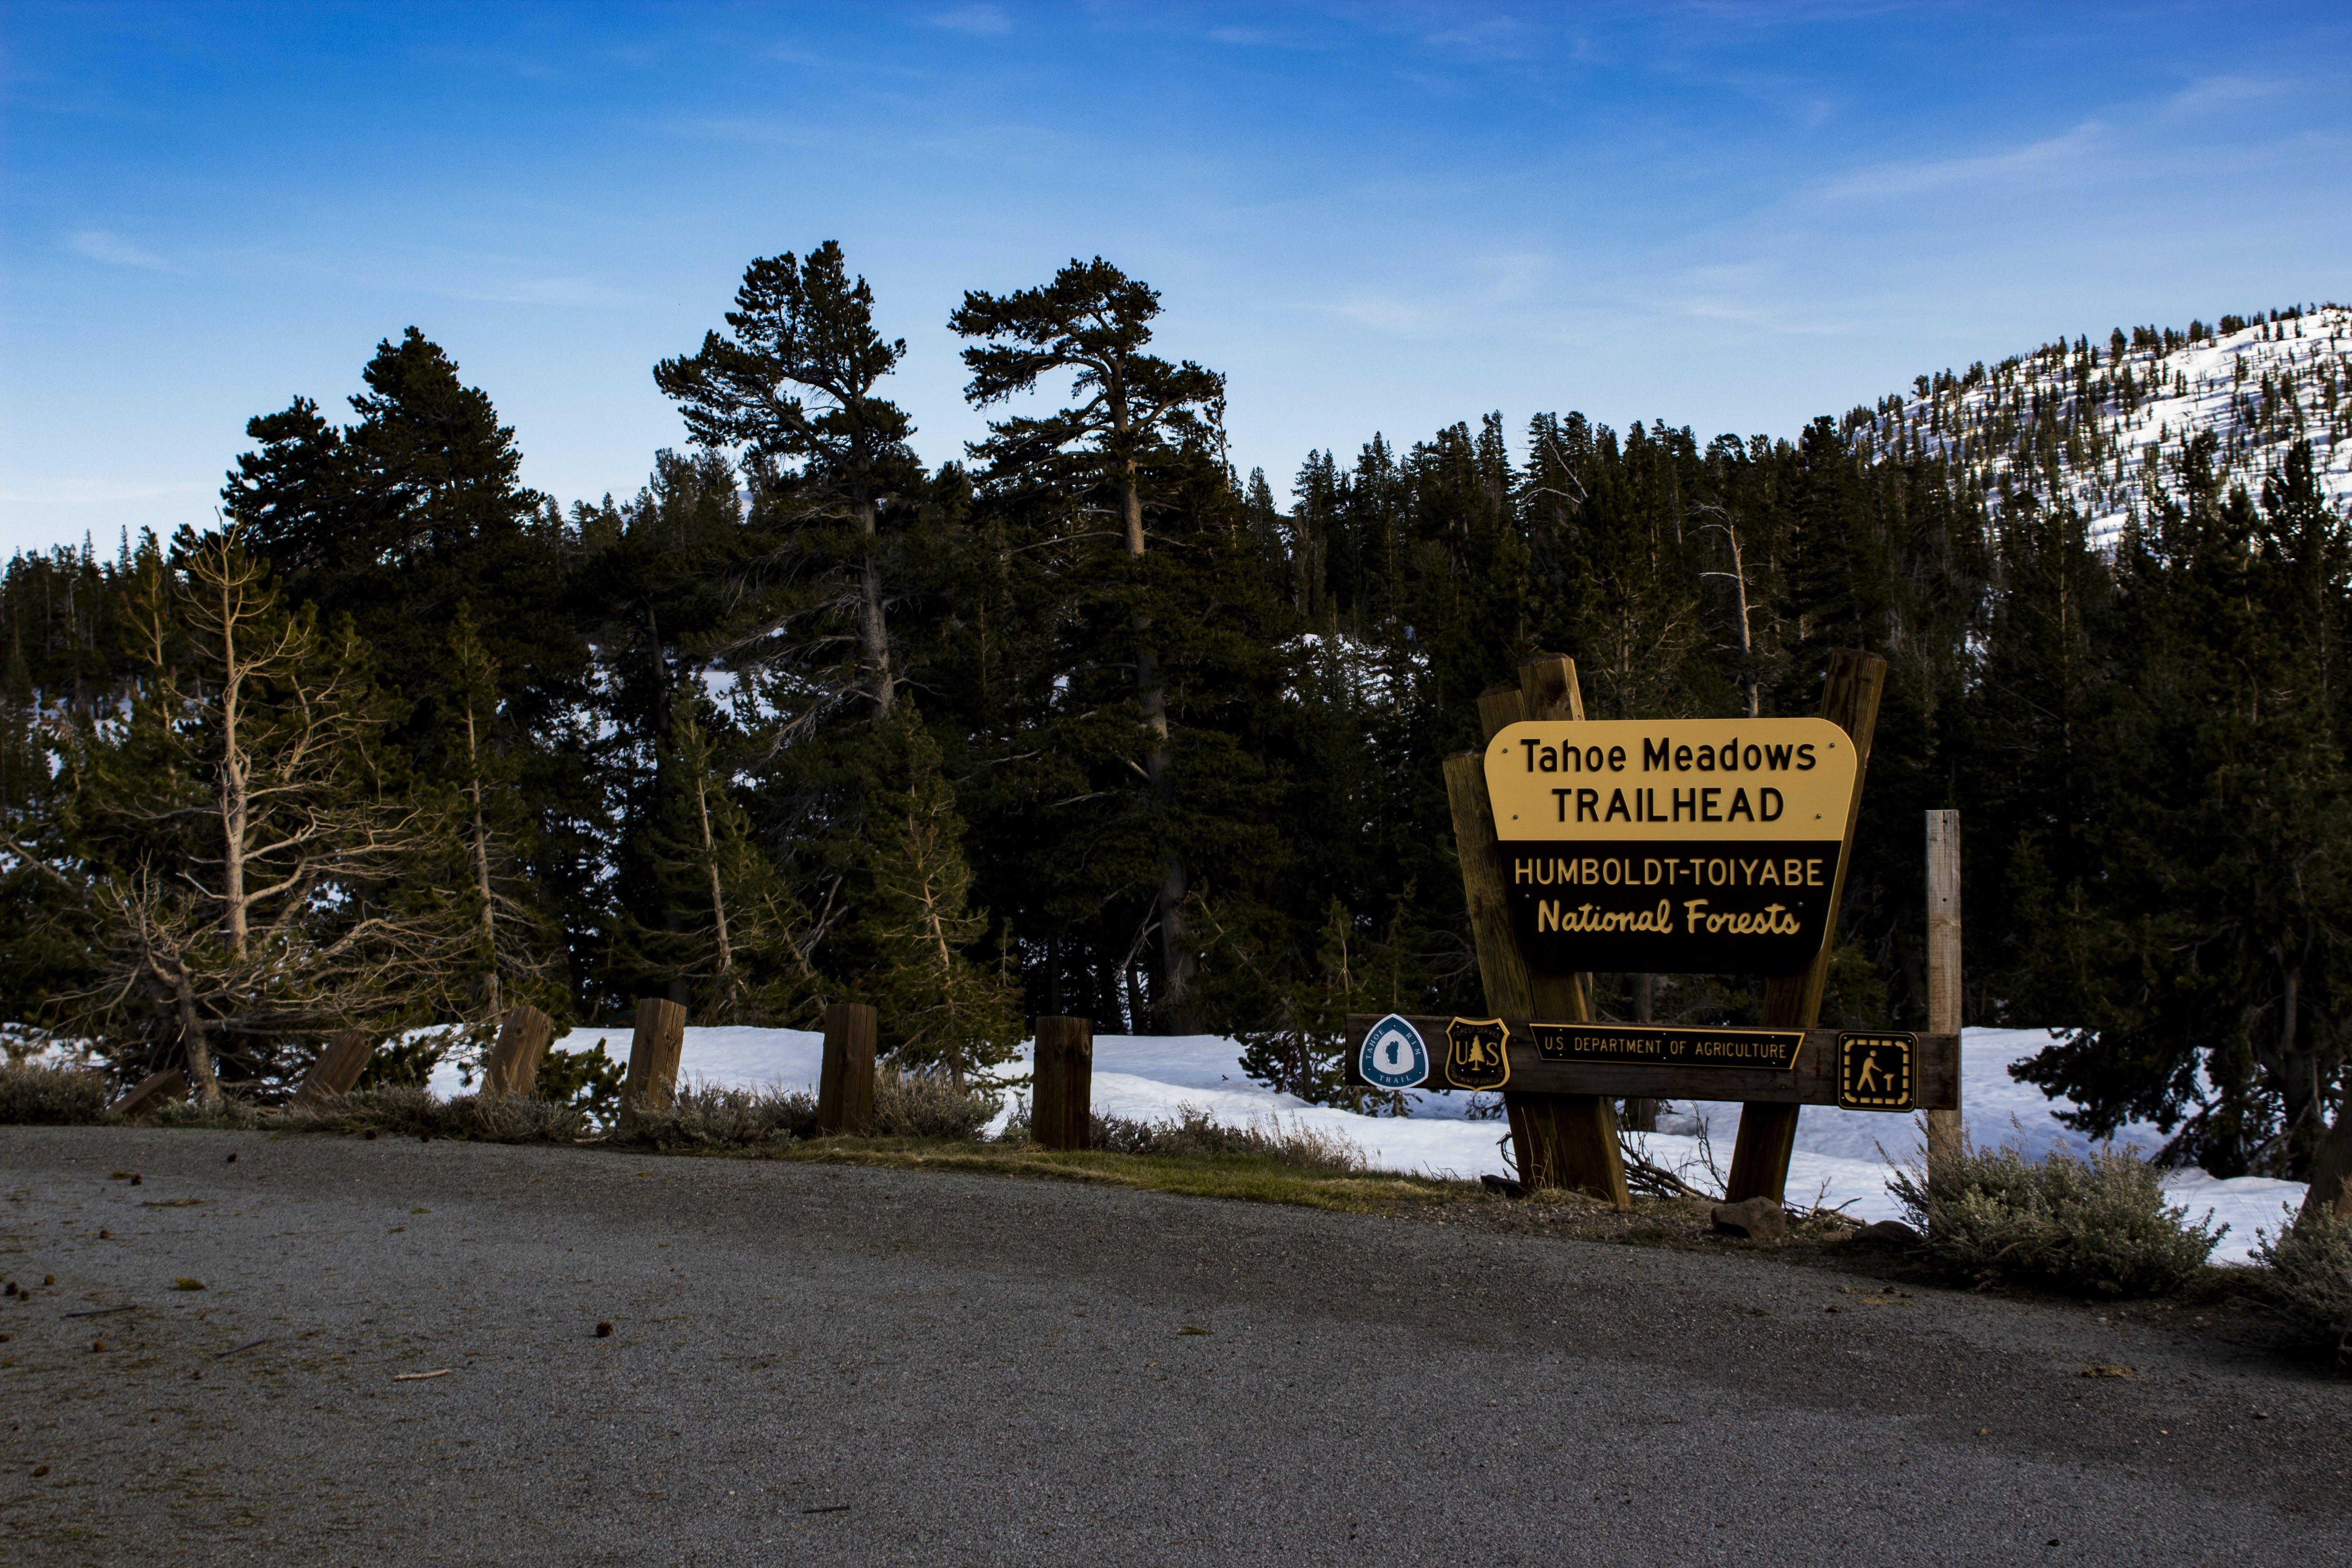 Tohoe Meadows Trailhead Signage